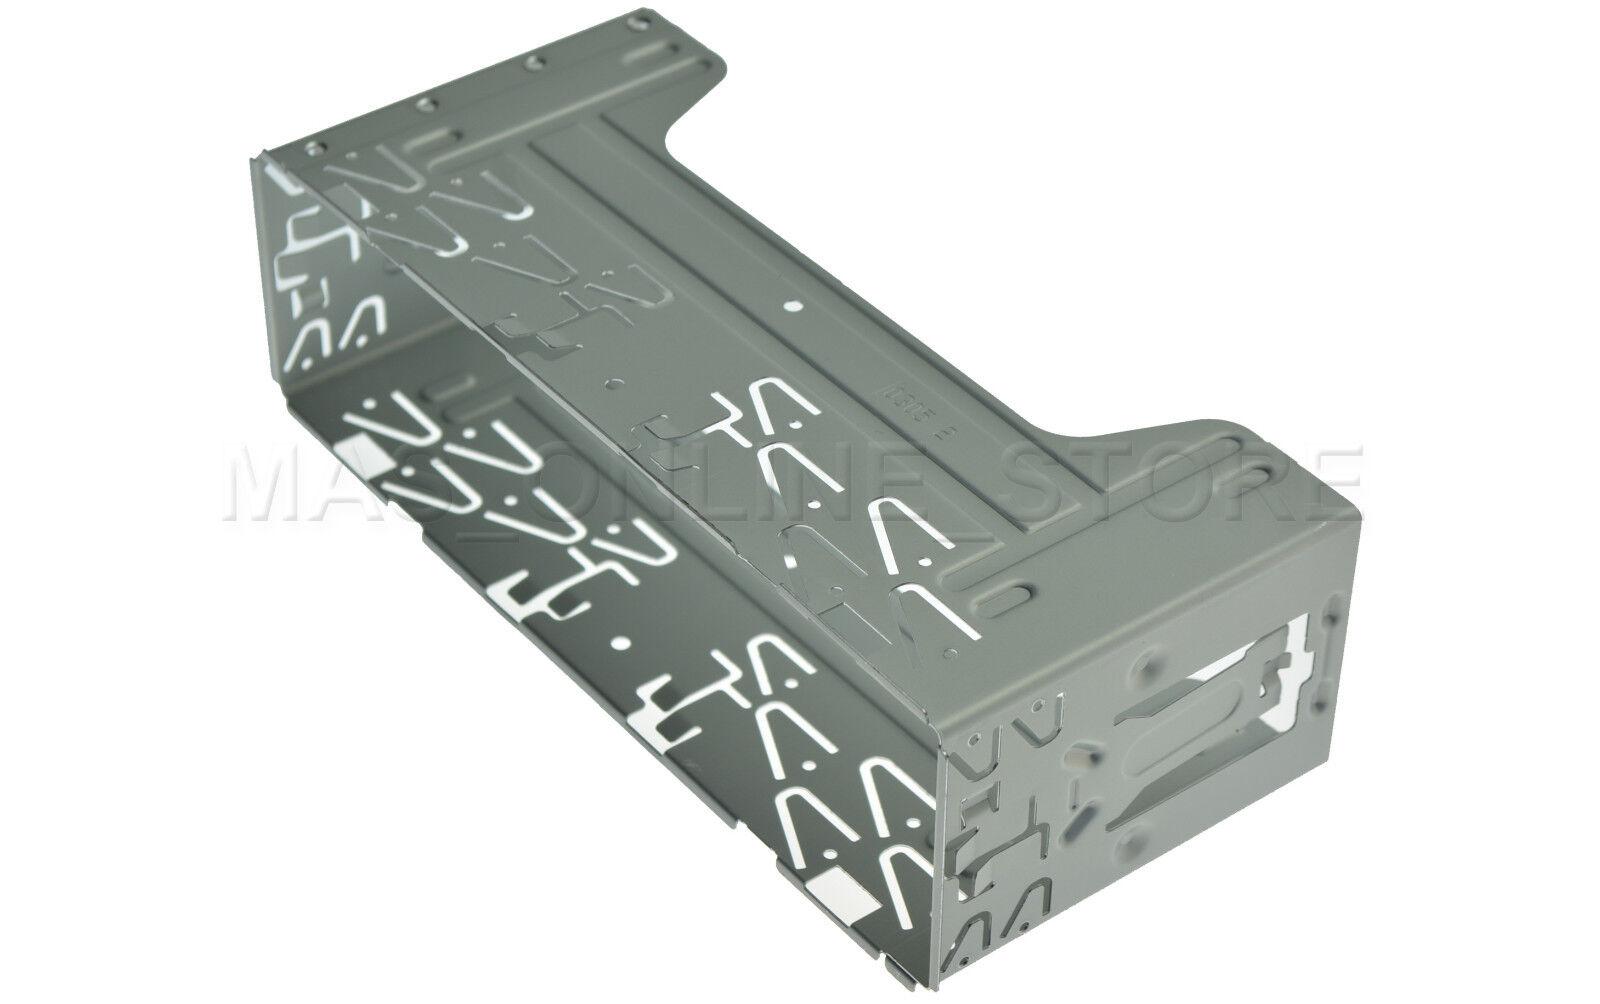 SLEEVE KENWOOD KDC-HD548U KDCHD548U KDC-HD458U KDCHD458U GENUINE MOUNTING CAGE